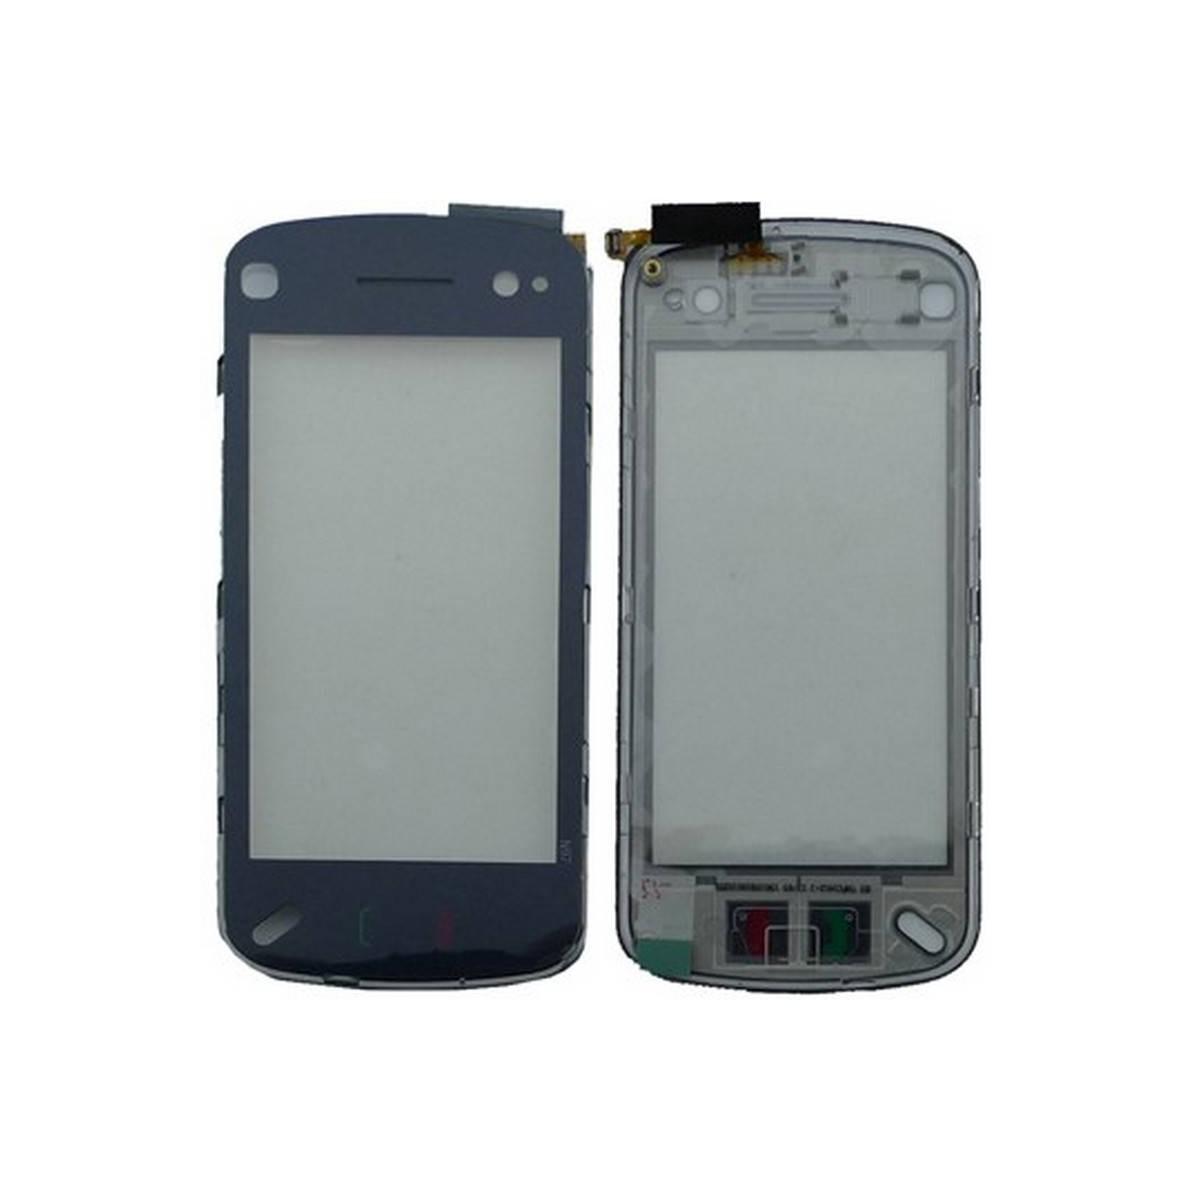 Pantalla táctil (Digitalizador) para Nokia N97